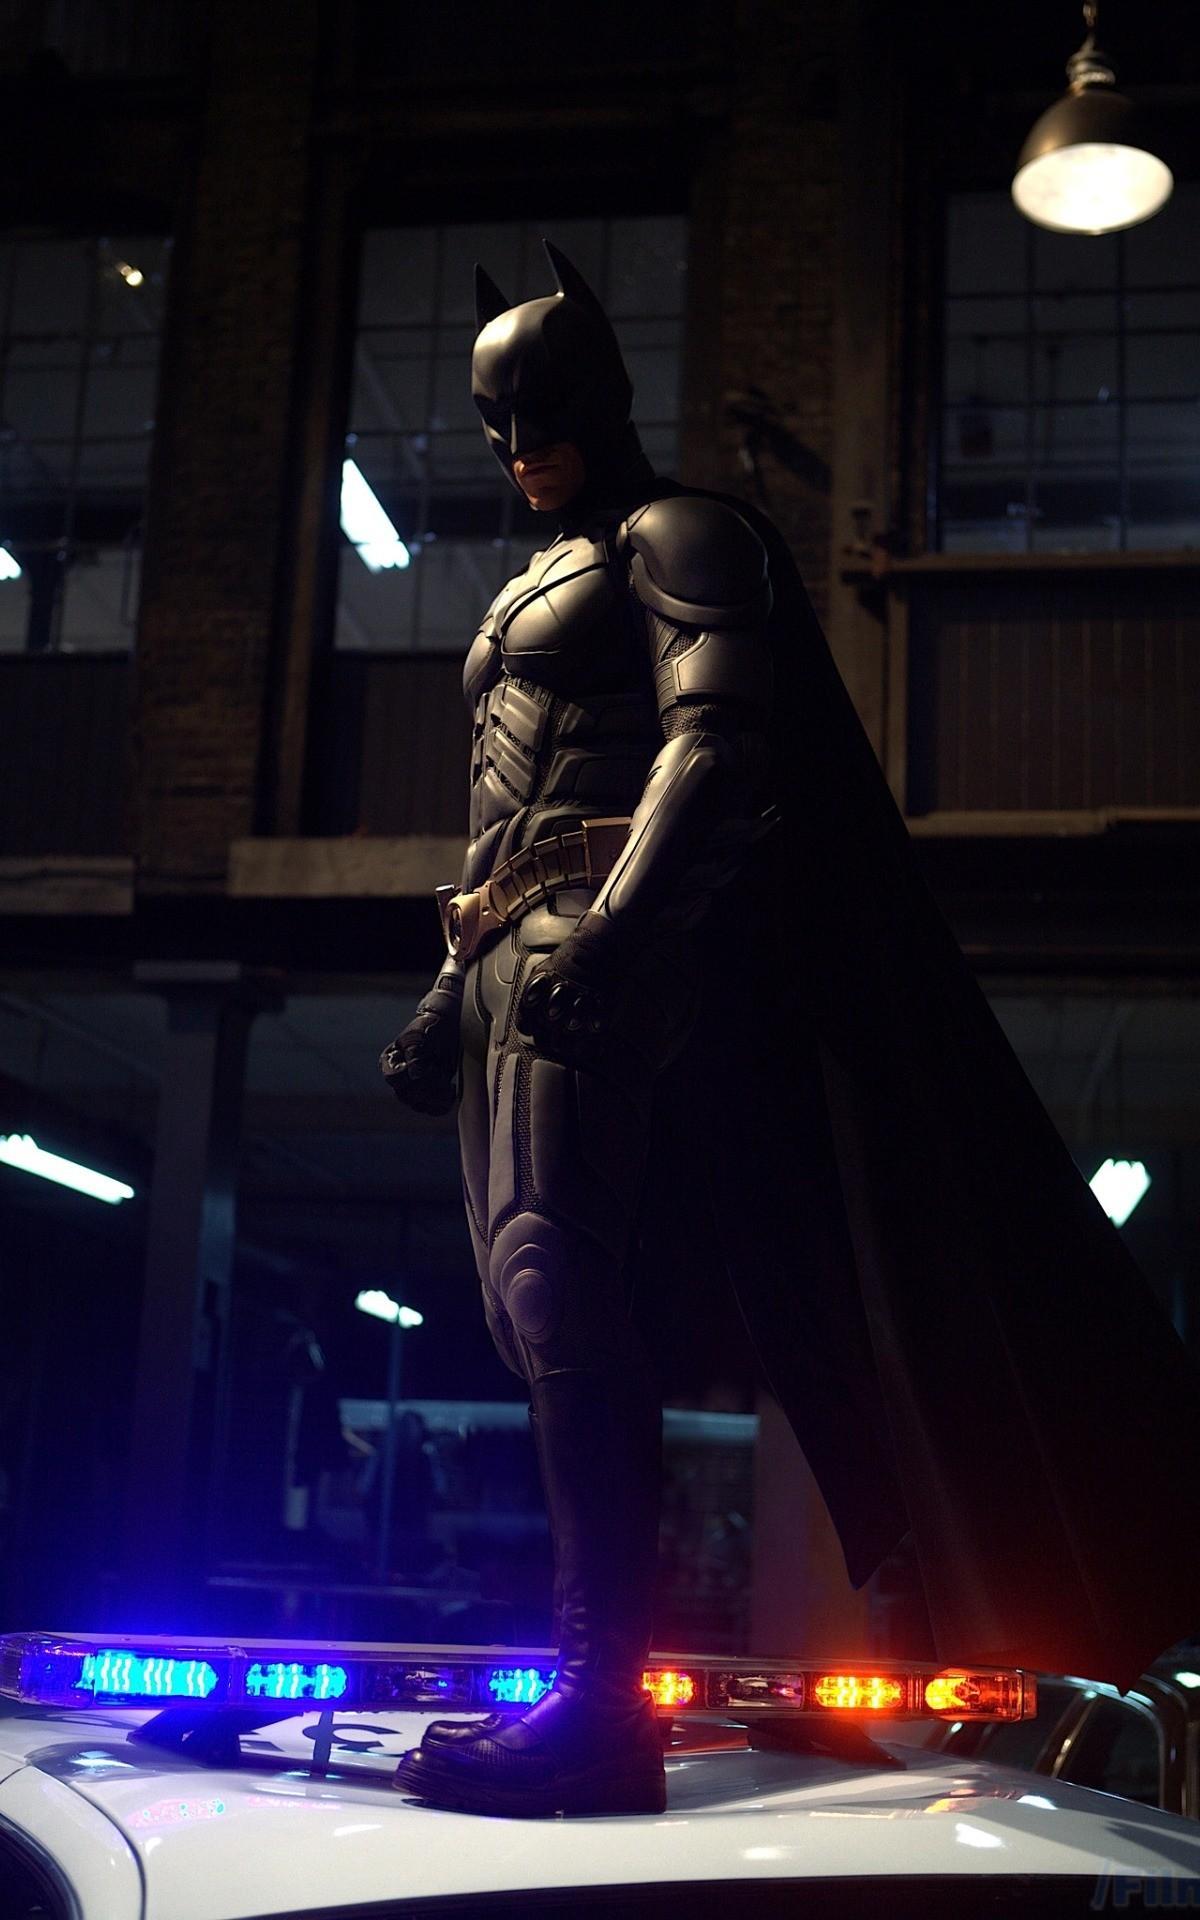 Batman The Dark Knight Car Wallpaper 1200x1920 Vertical Wallpapers Hd 52 Images